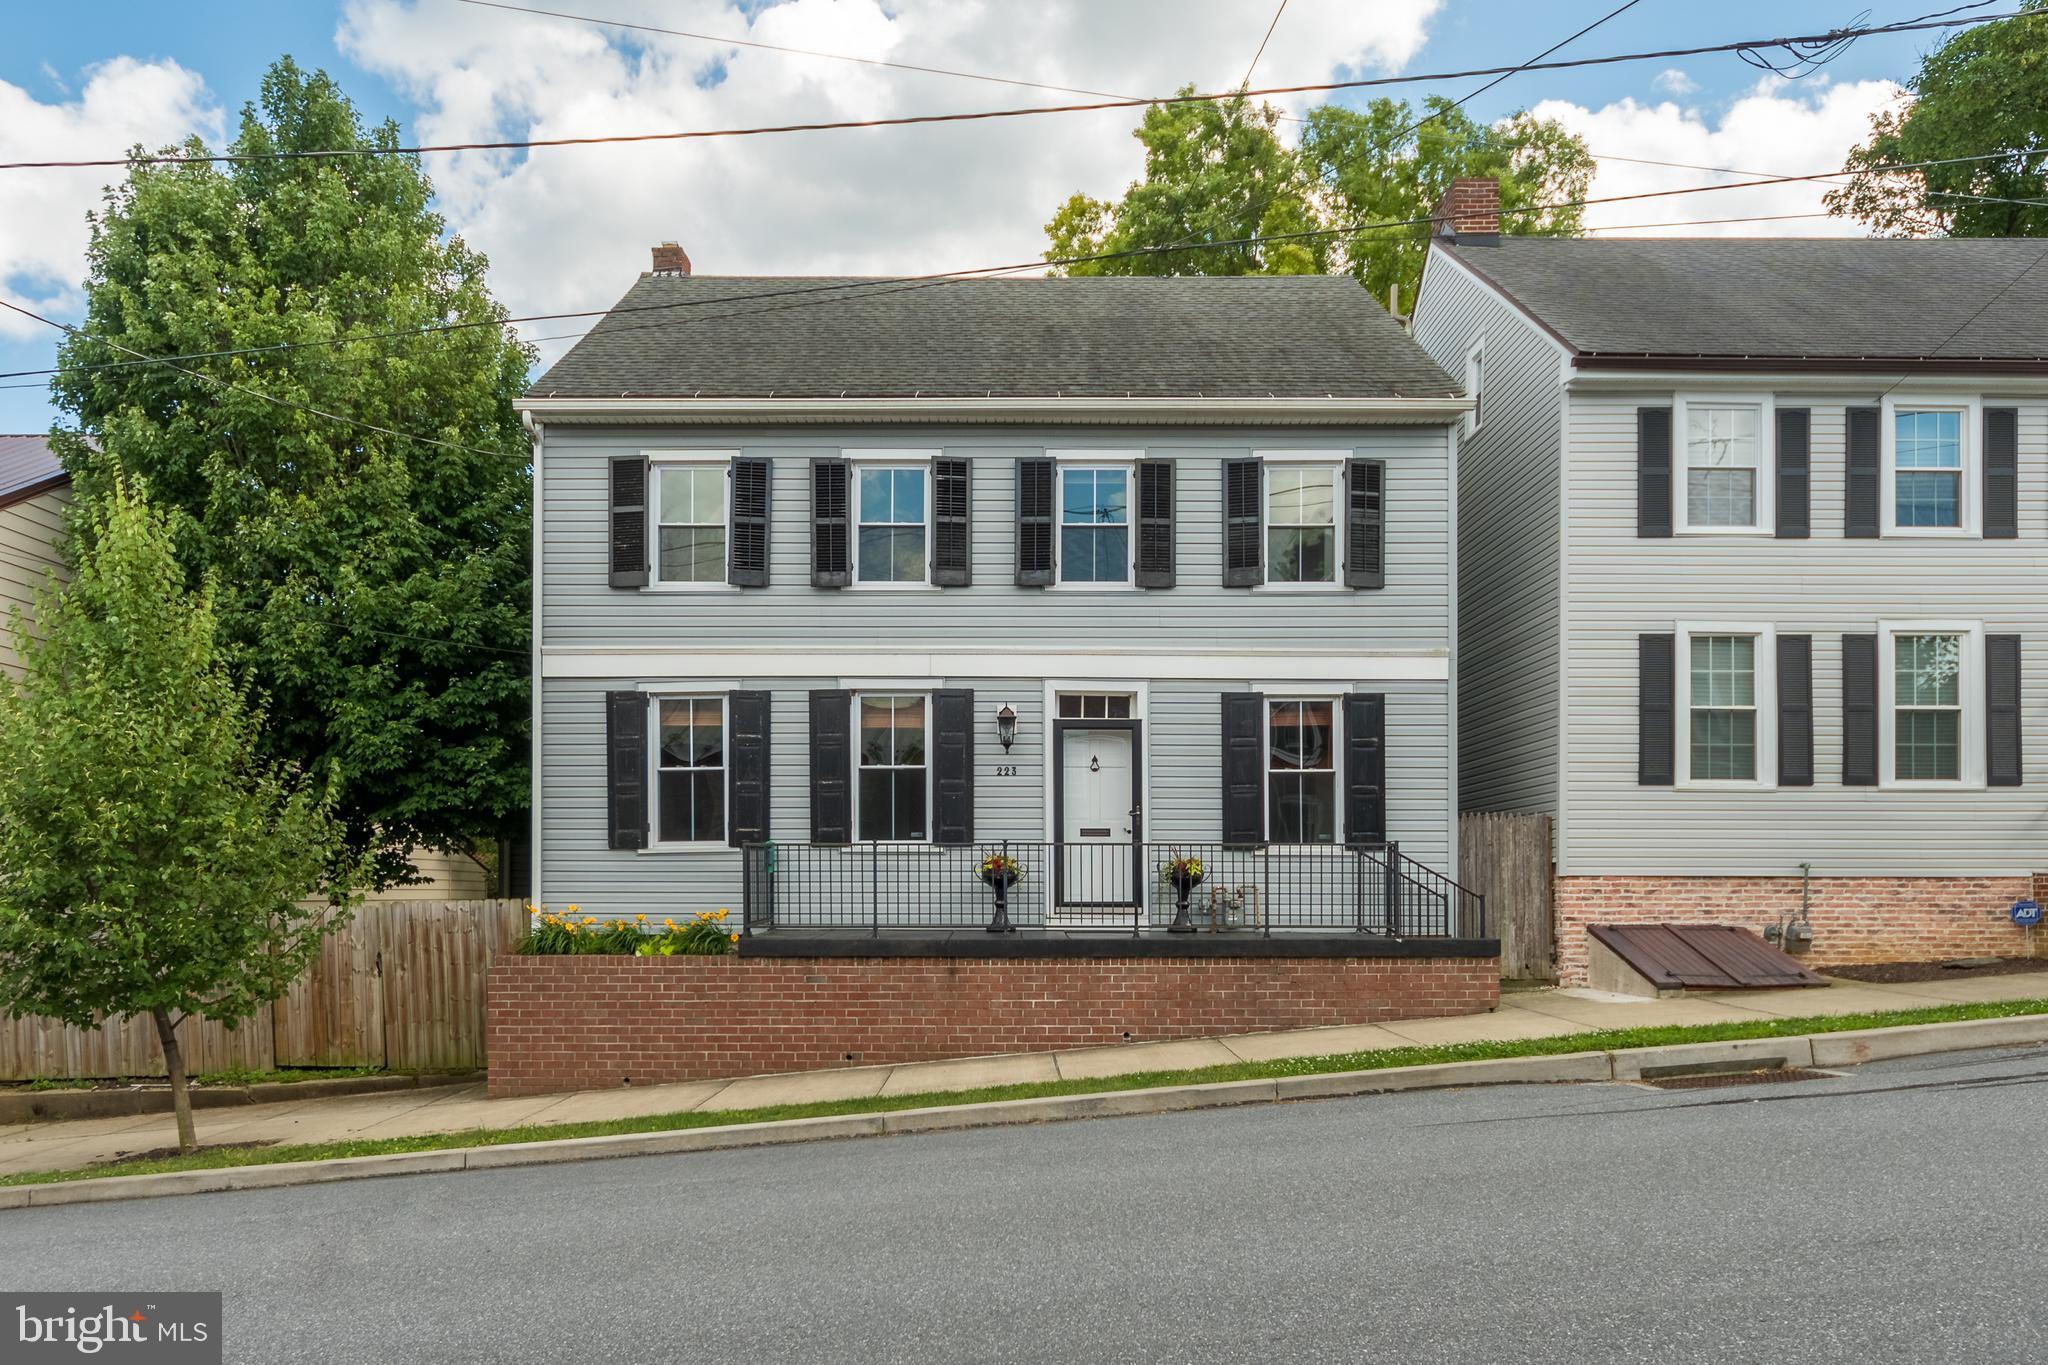 223 LOCUST STREET, WRIGHTSVILLE, PA 17368